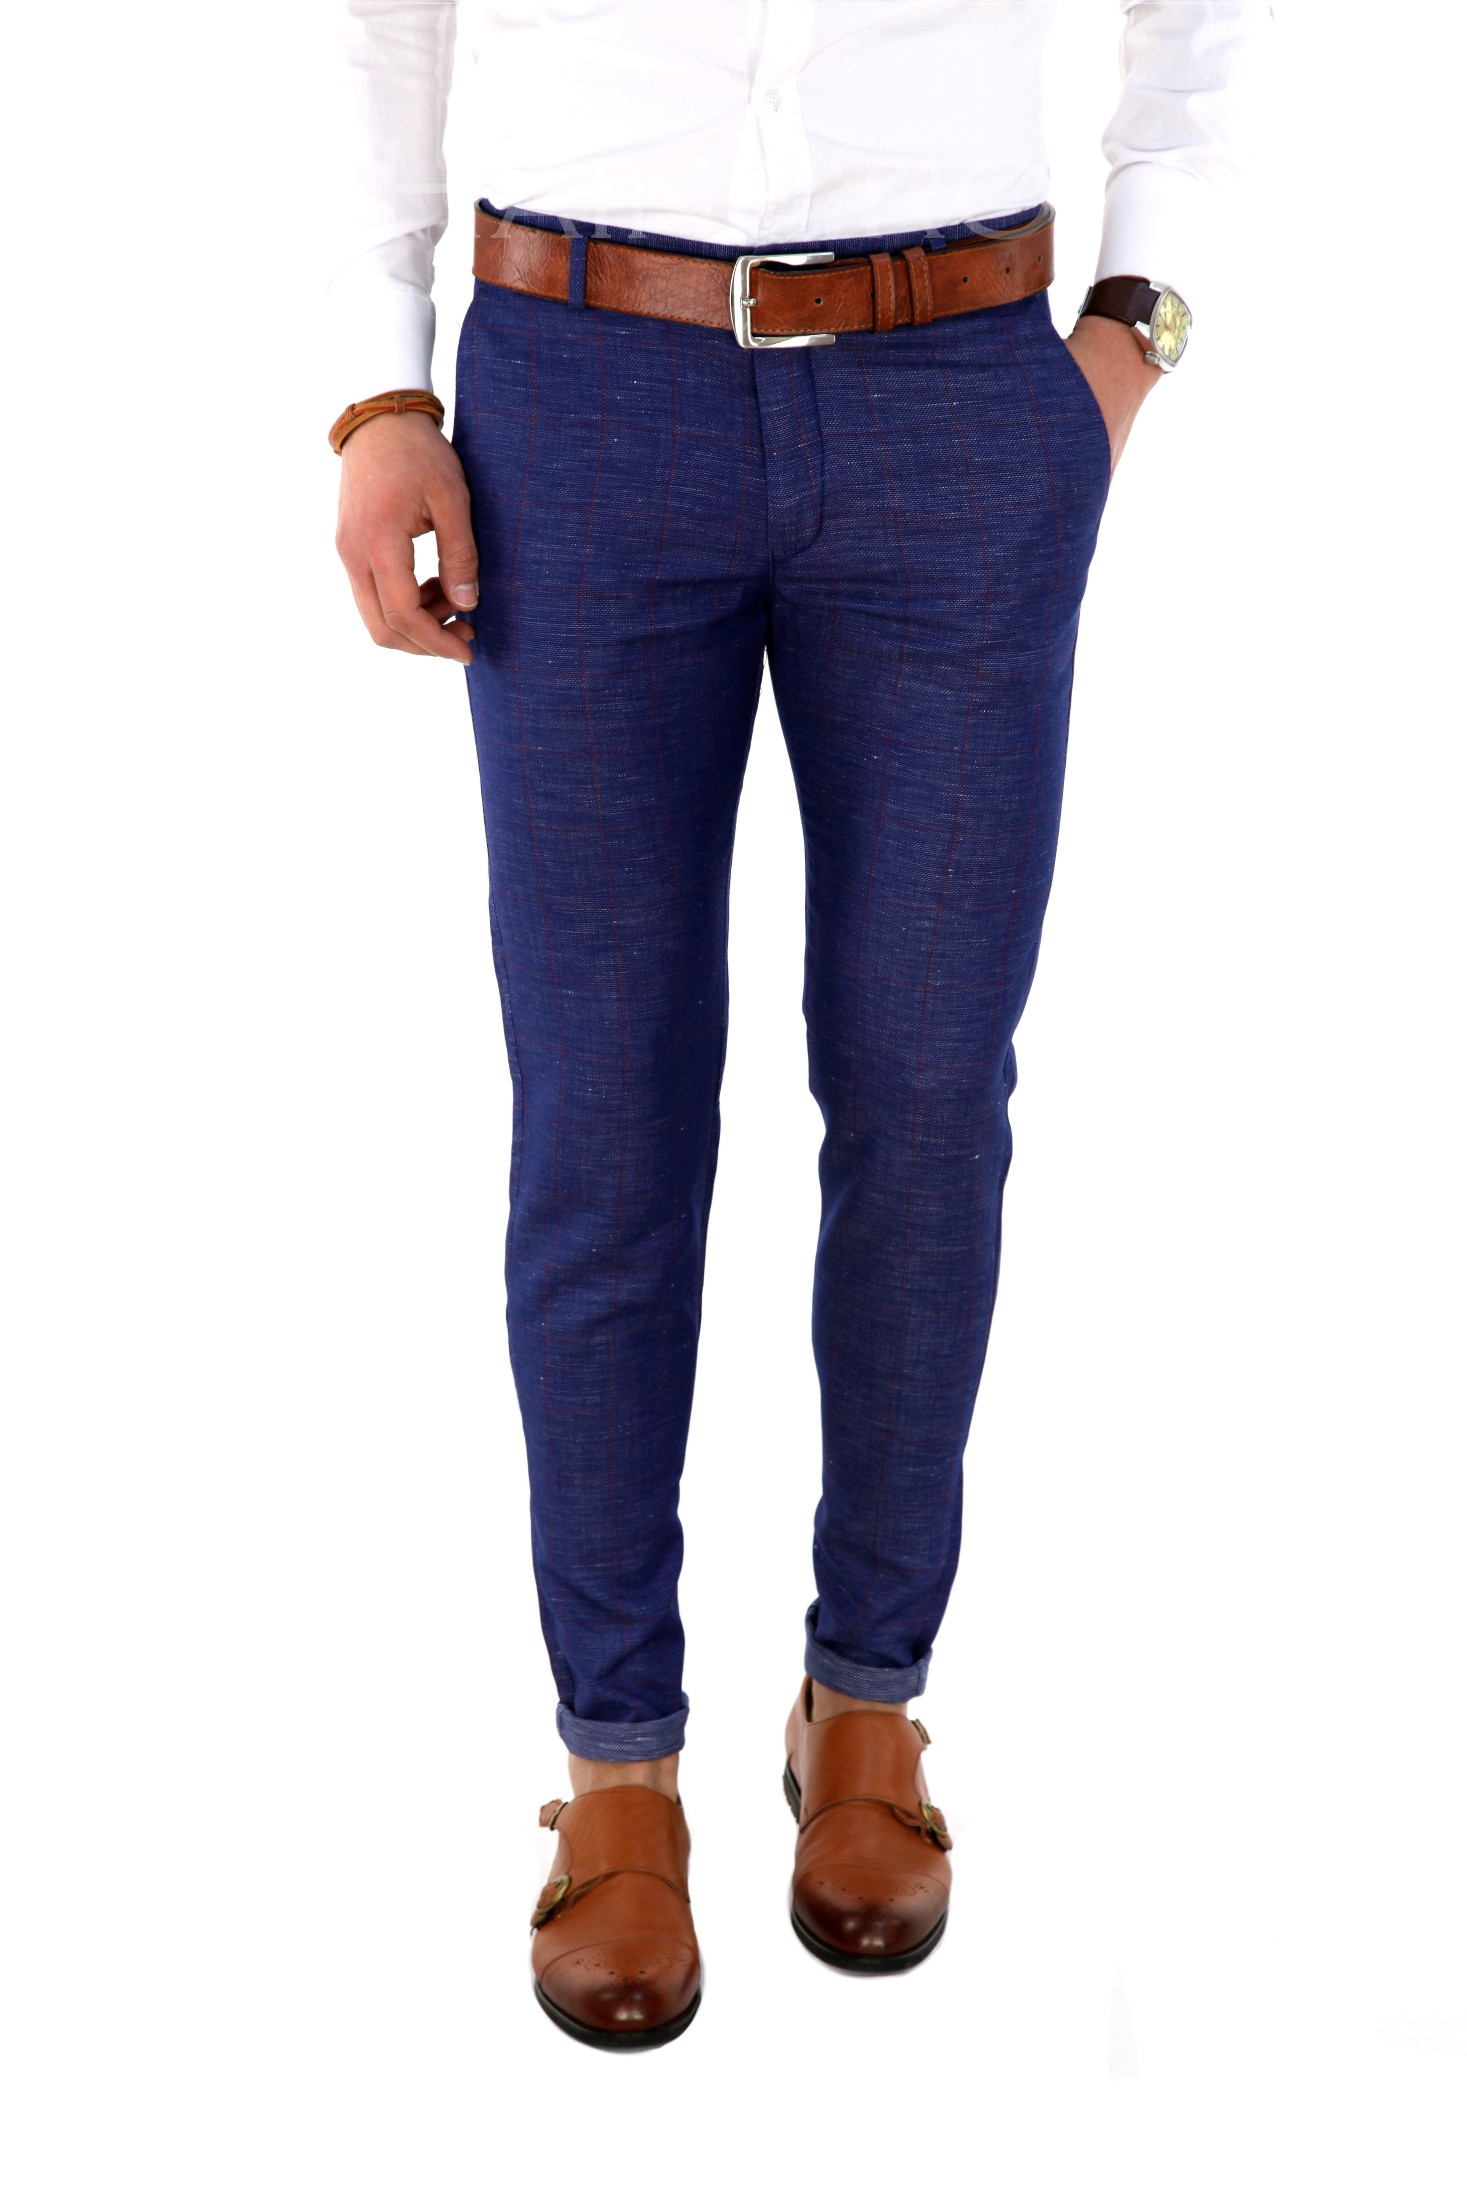 Pantaloni barbati eleganti carouri ZR 7839 J4-1